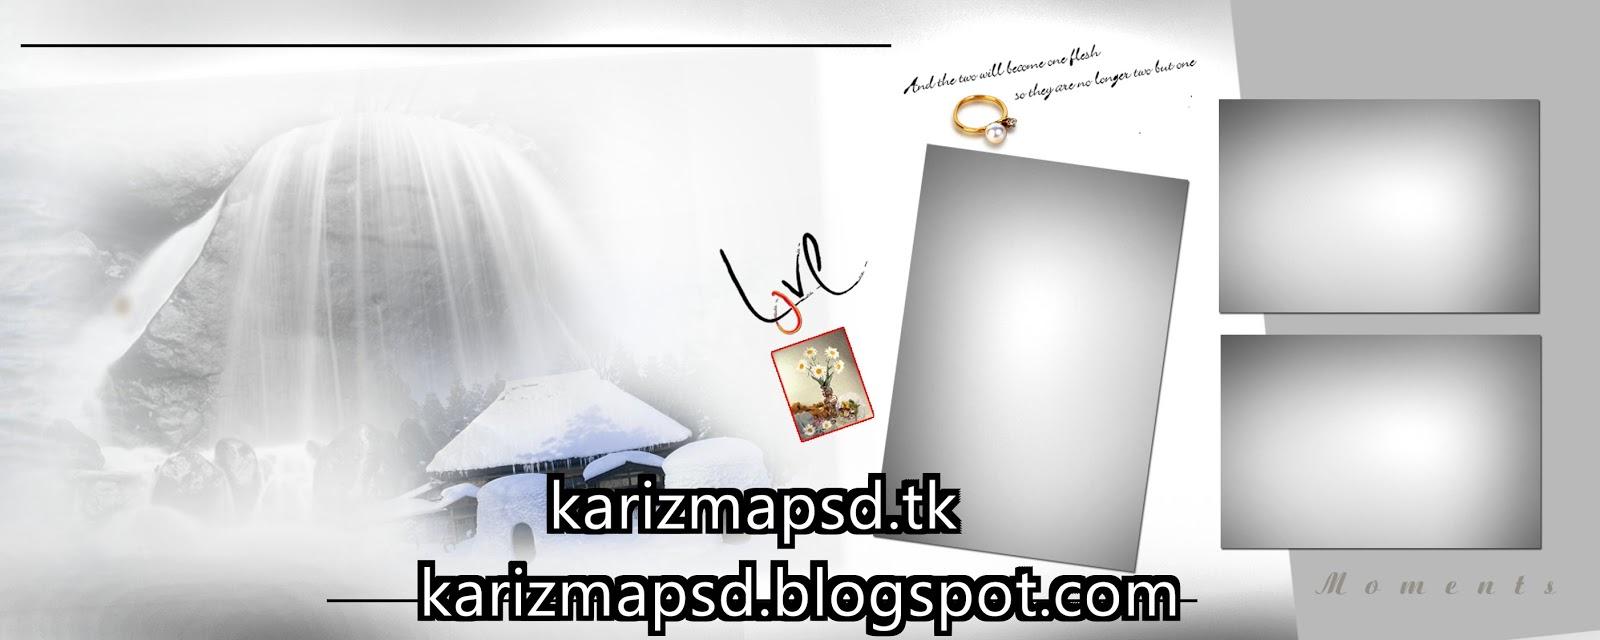 6×15 Indian Karizma Wedding Album Photoshop PSD Templates Set 10 ...